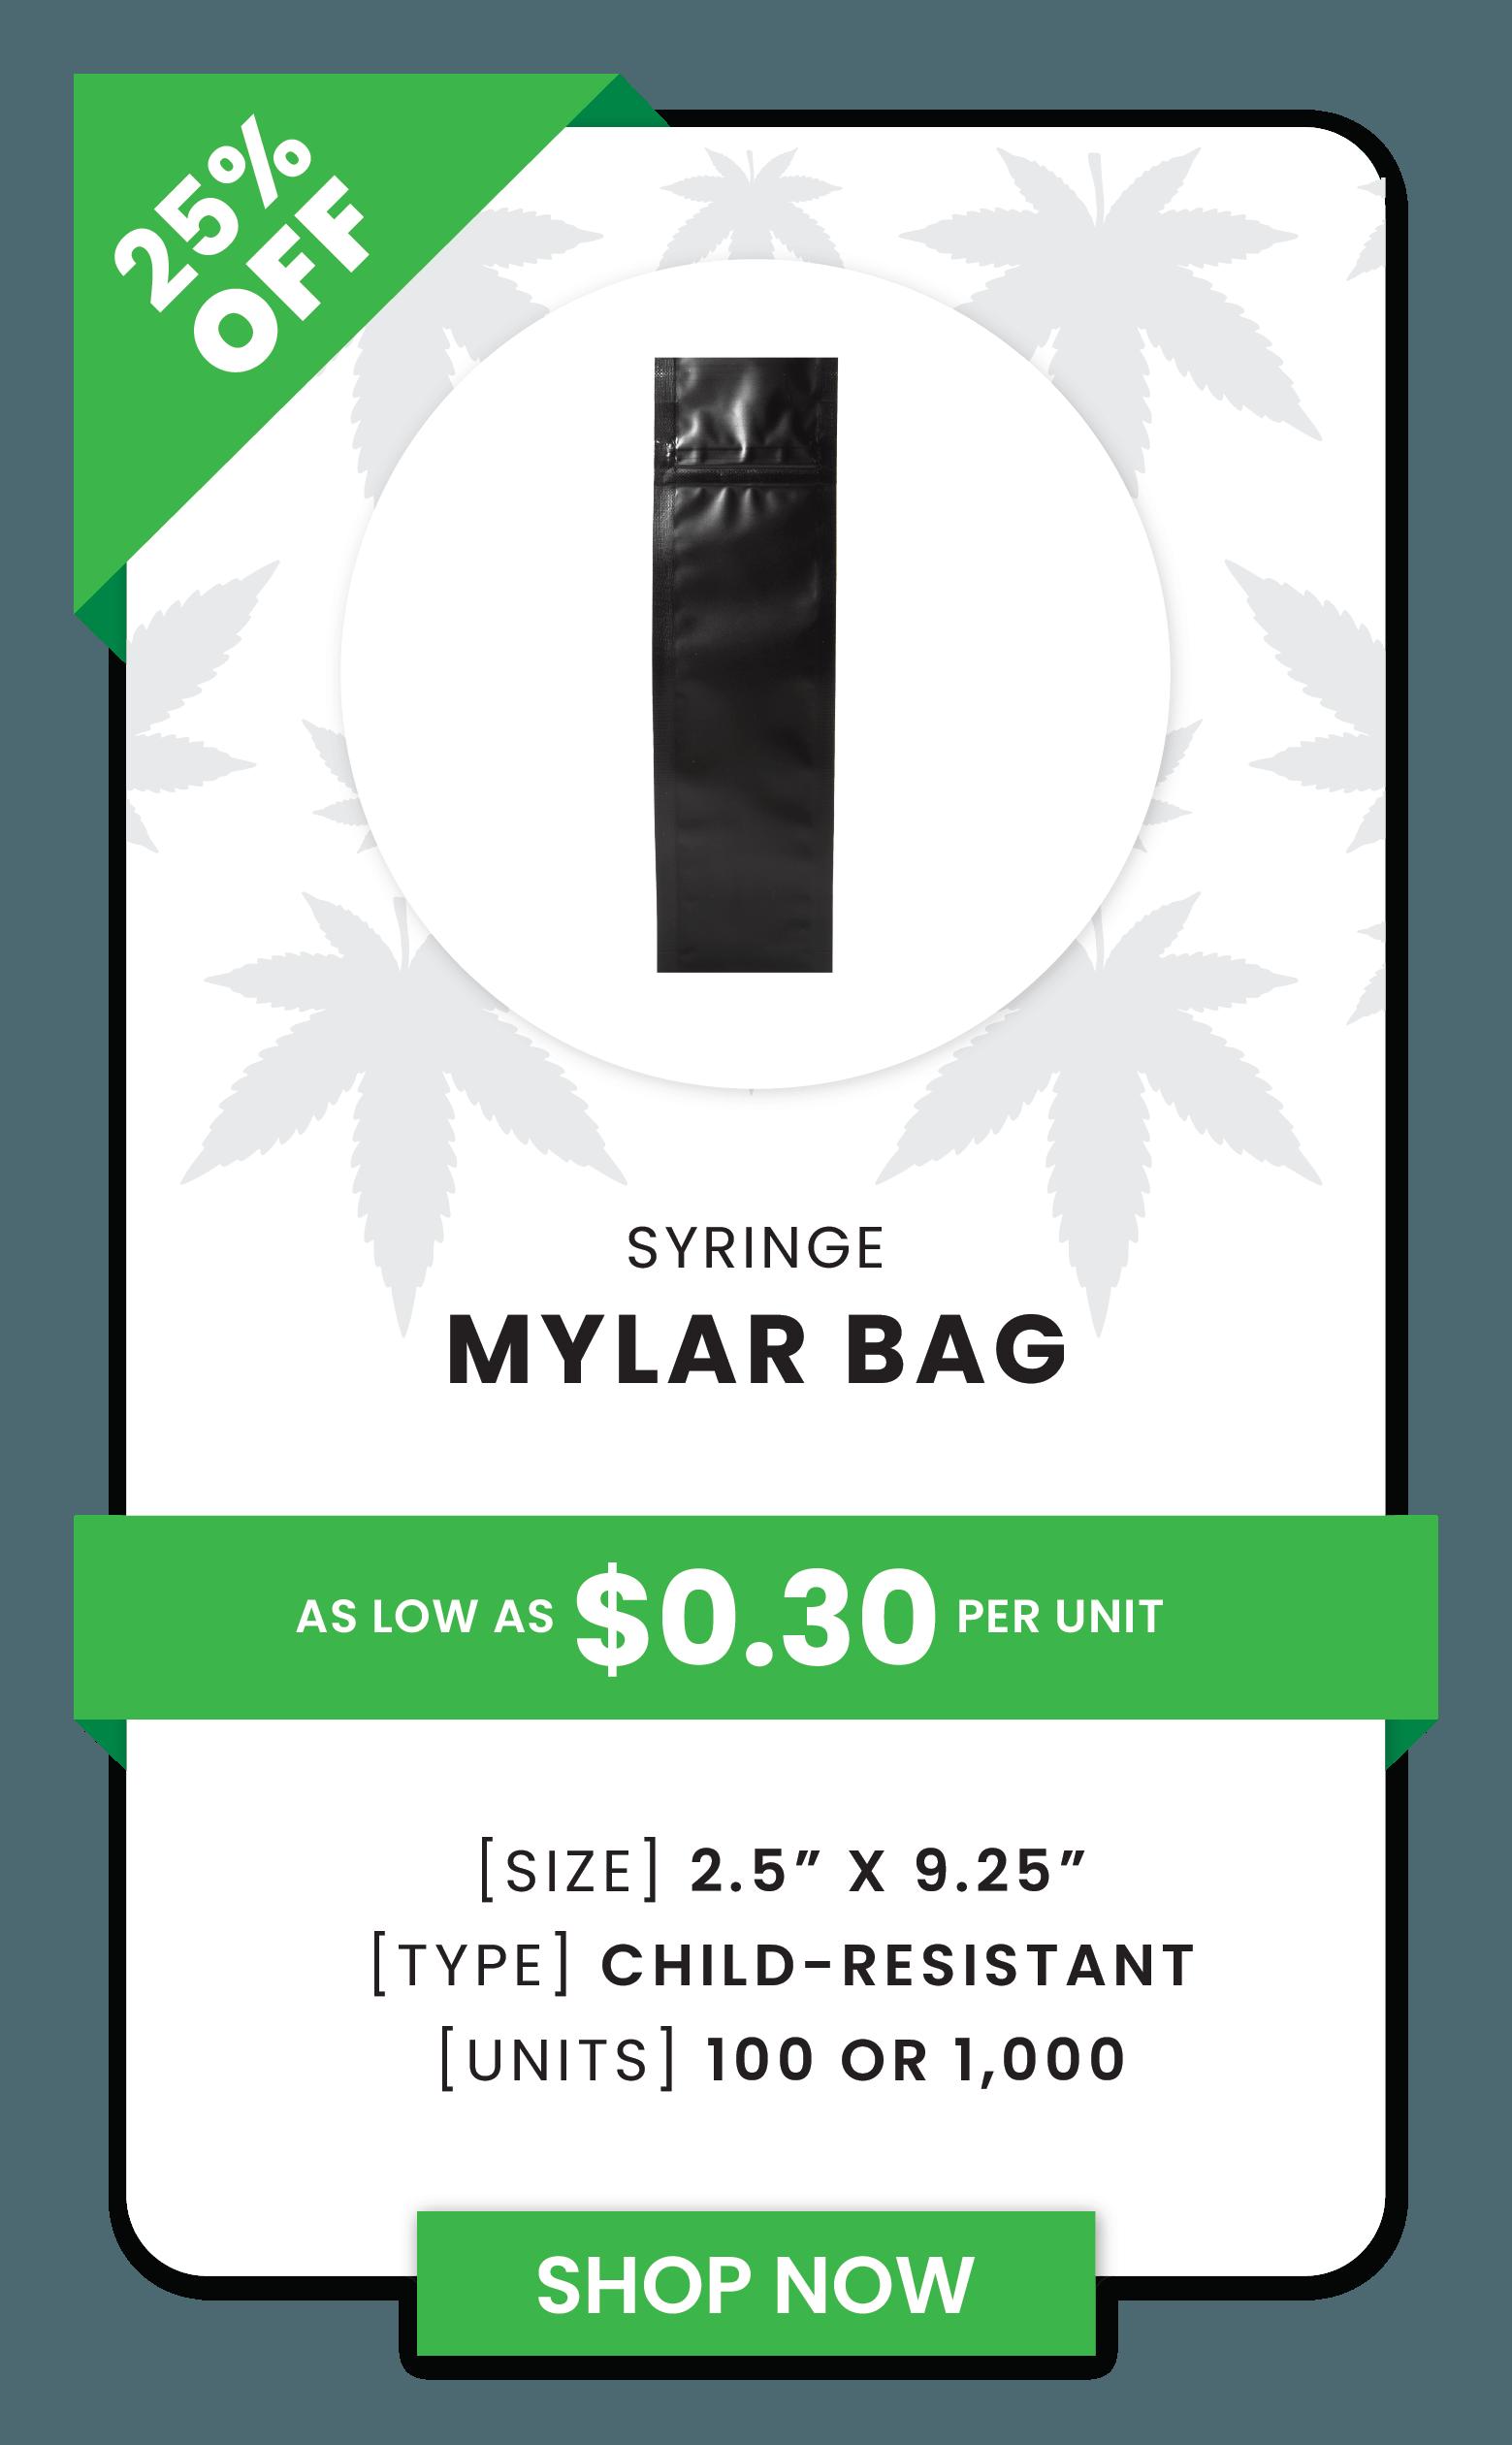 DSC-dispensary-supply-canada-sales-mylar-bag-syringe